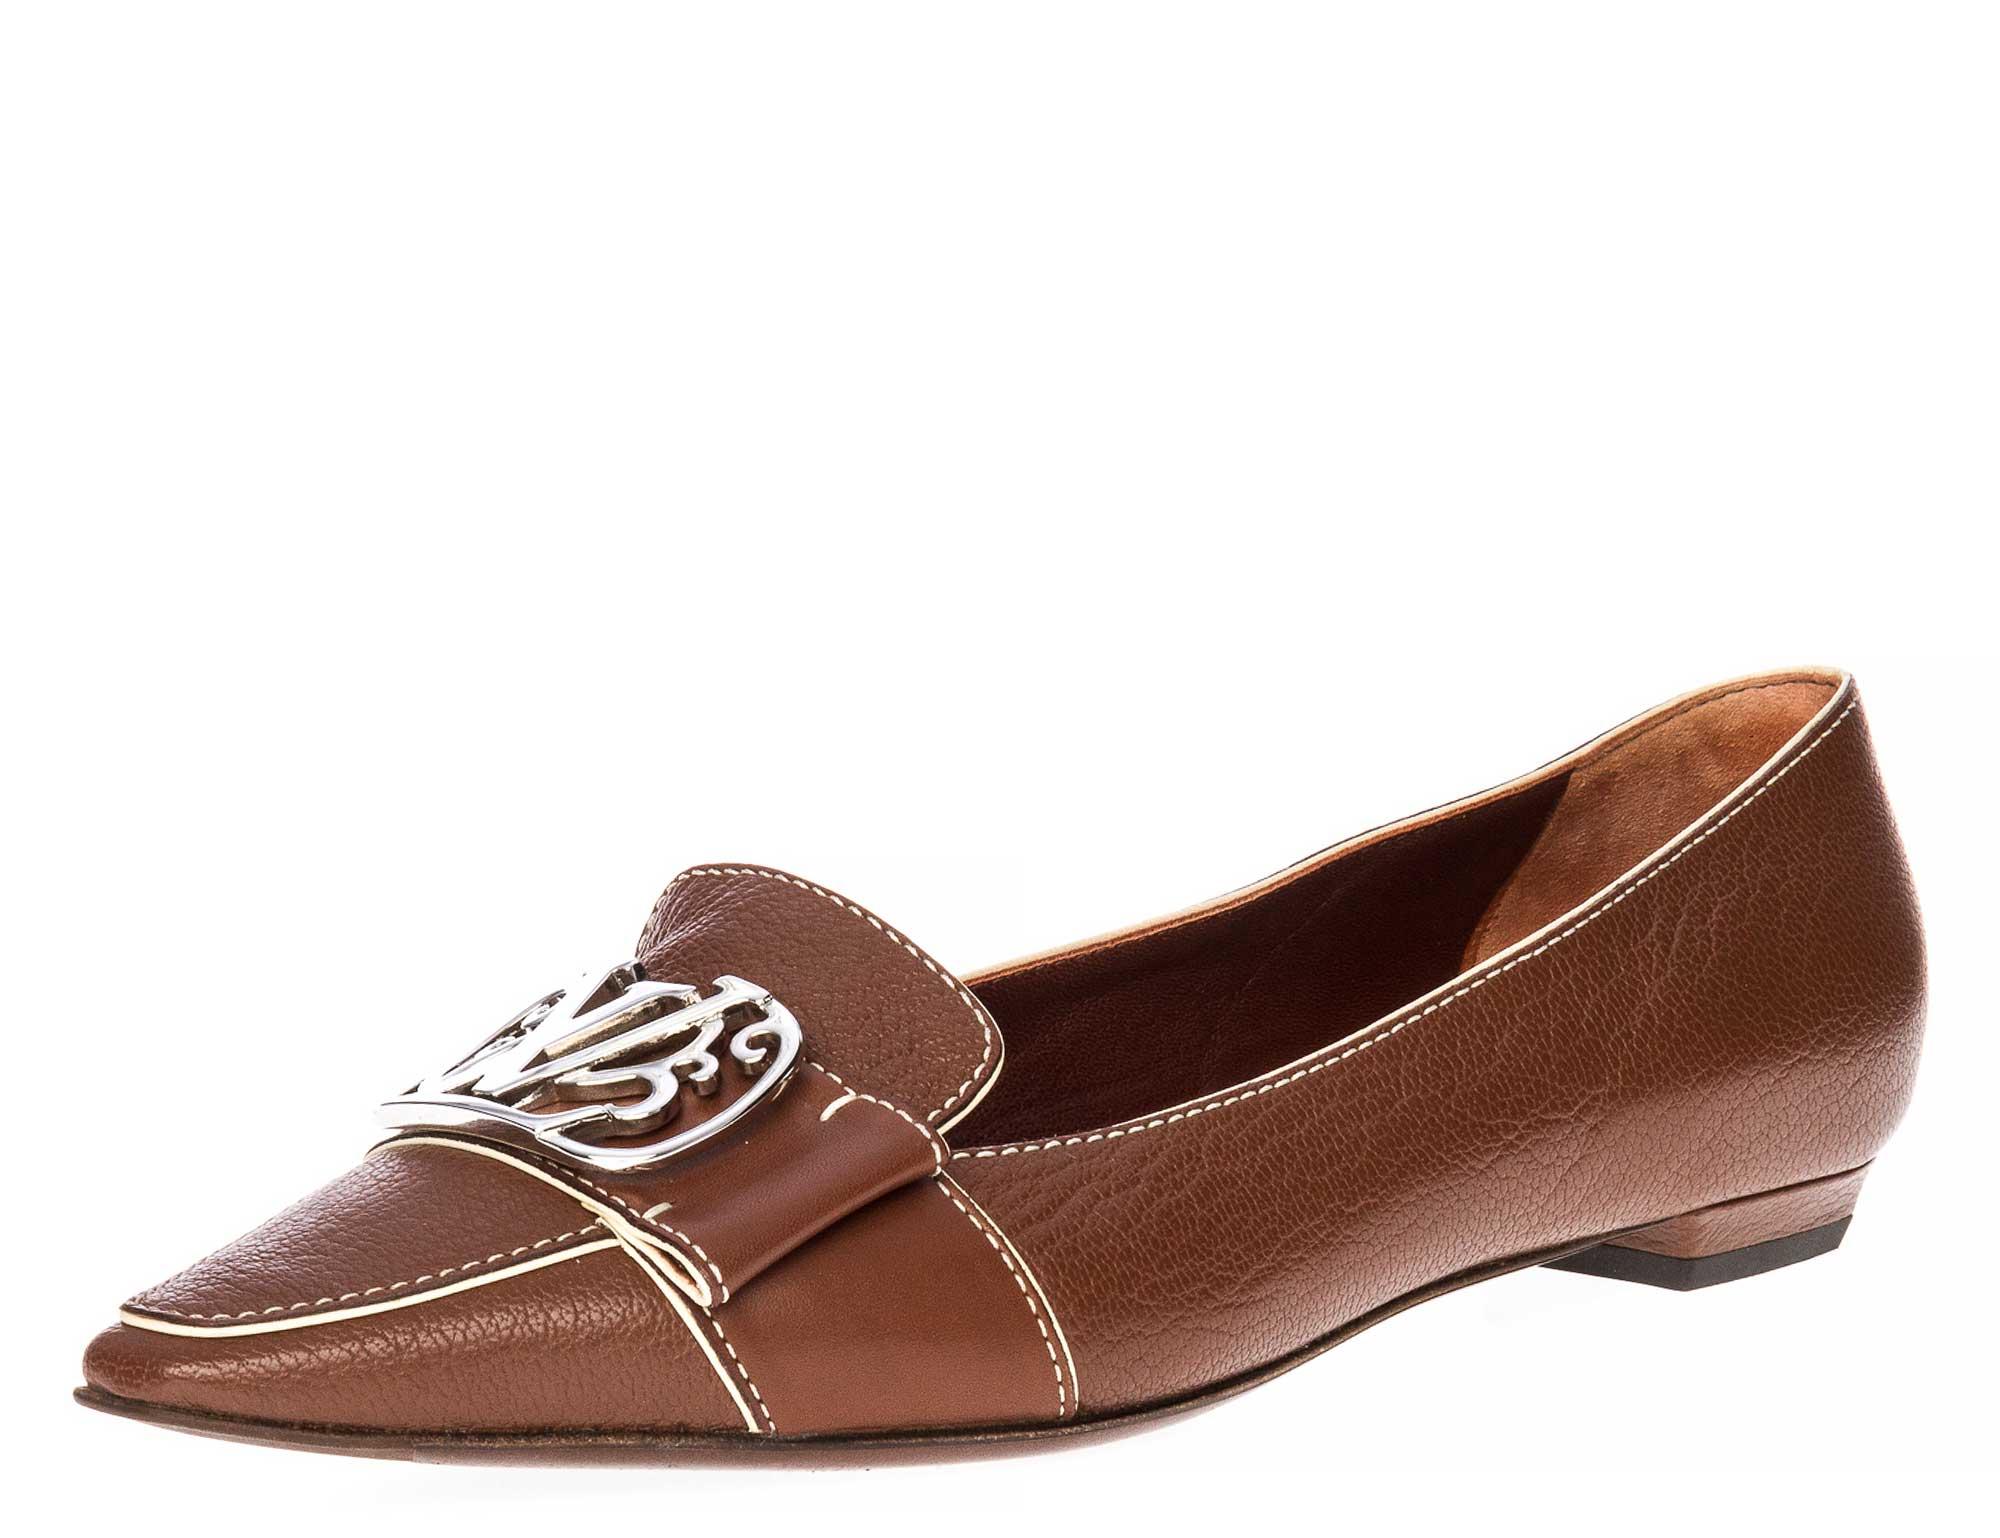 louis vuitton loafers braun gr 36 5 echtleder wie neu ebay. Black Bedroom Furniture Sets. Home Design Ideas